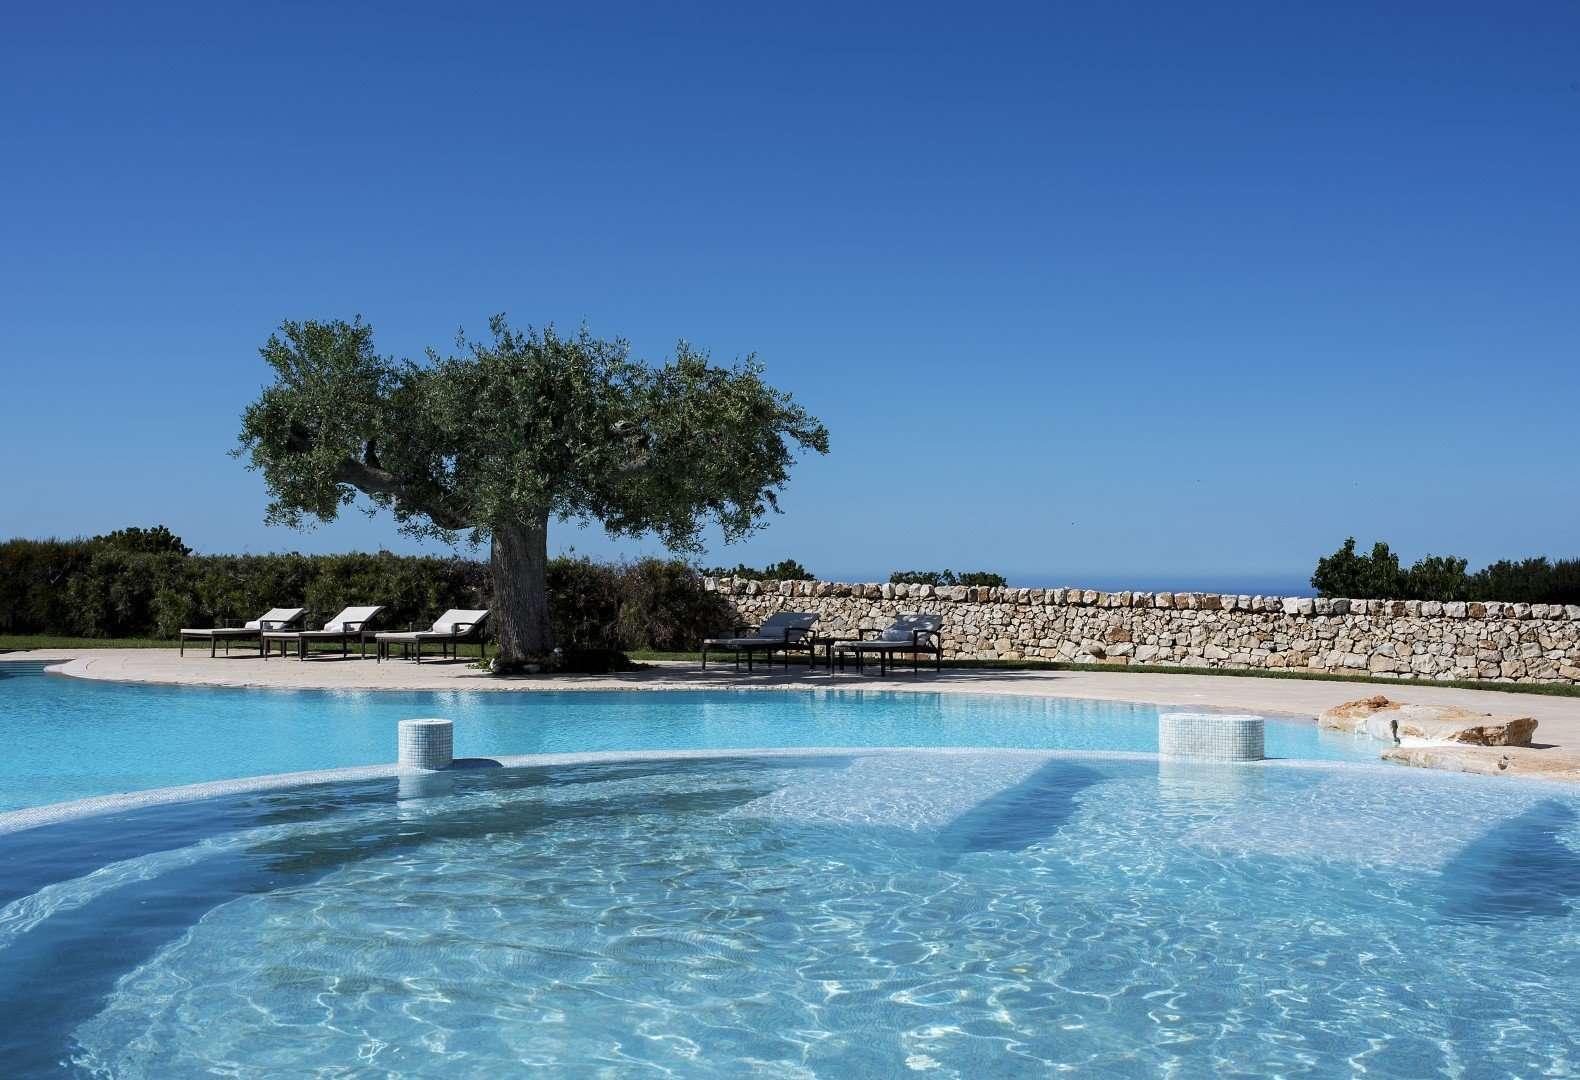 borgobianco - puglia - italie - zwembad met olijfboom.jpg